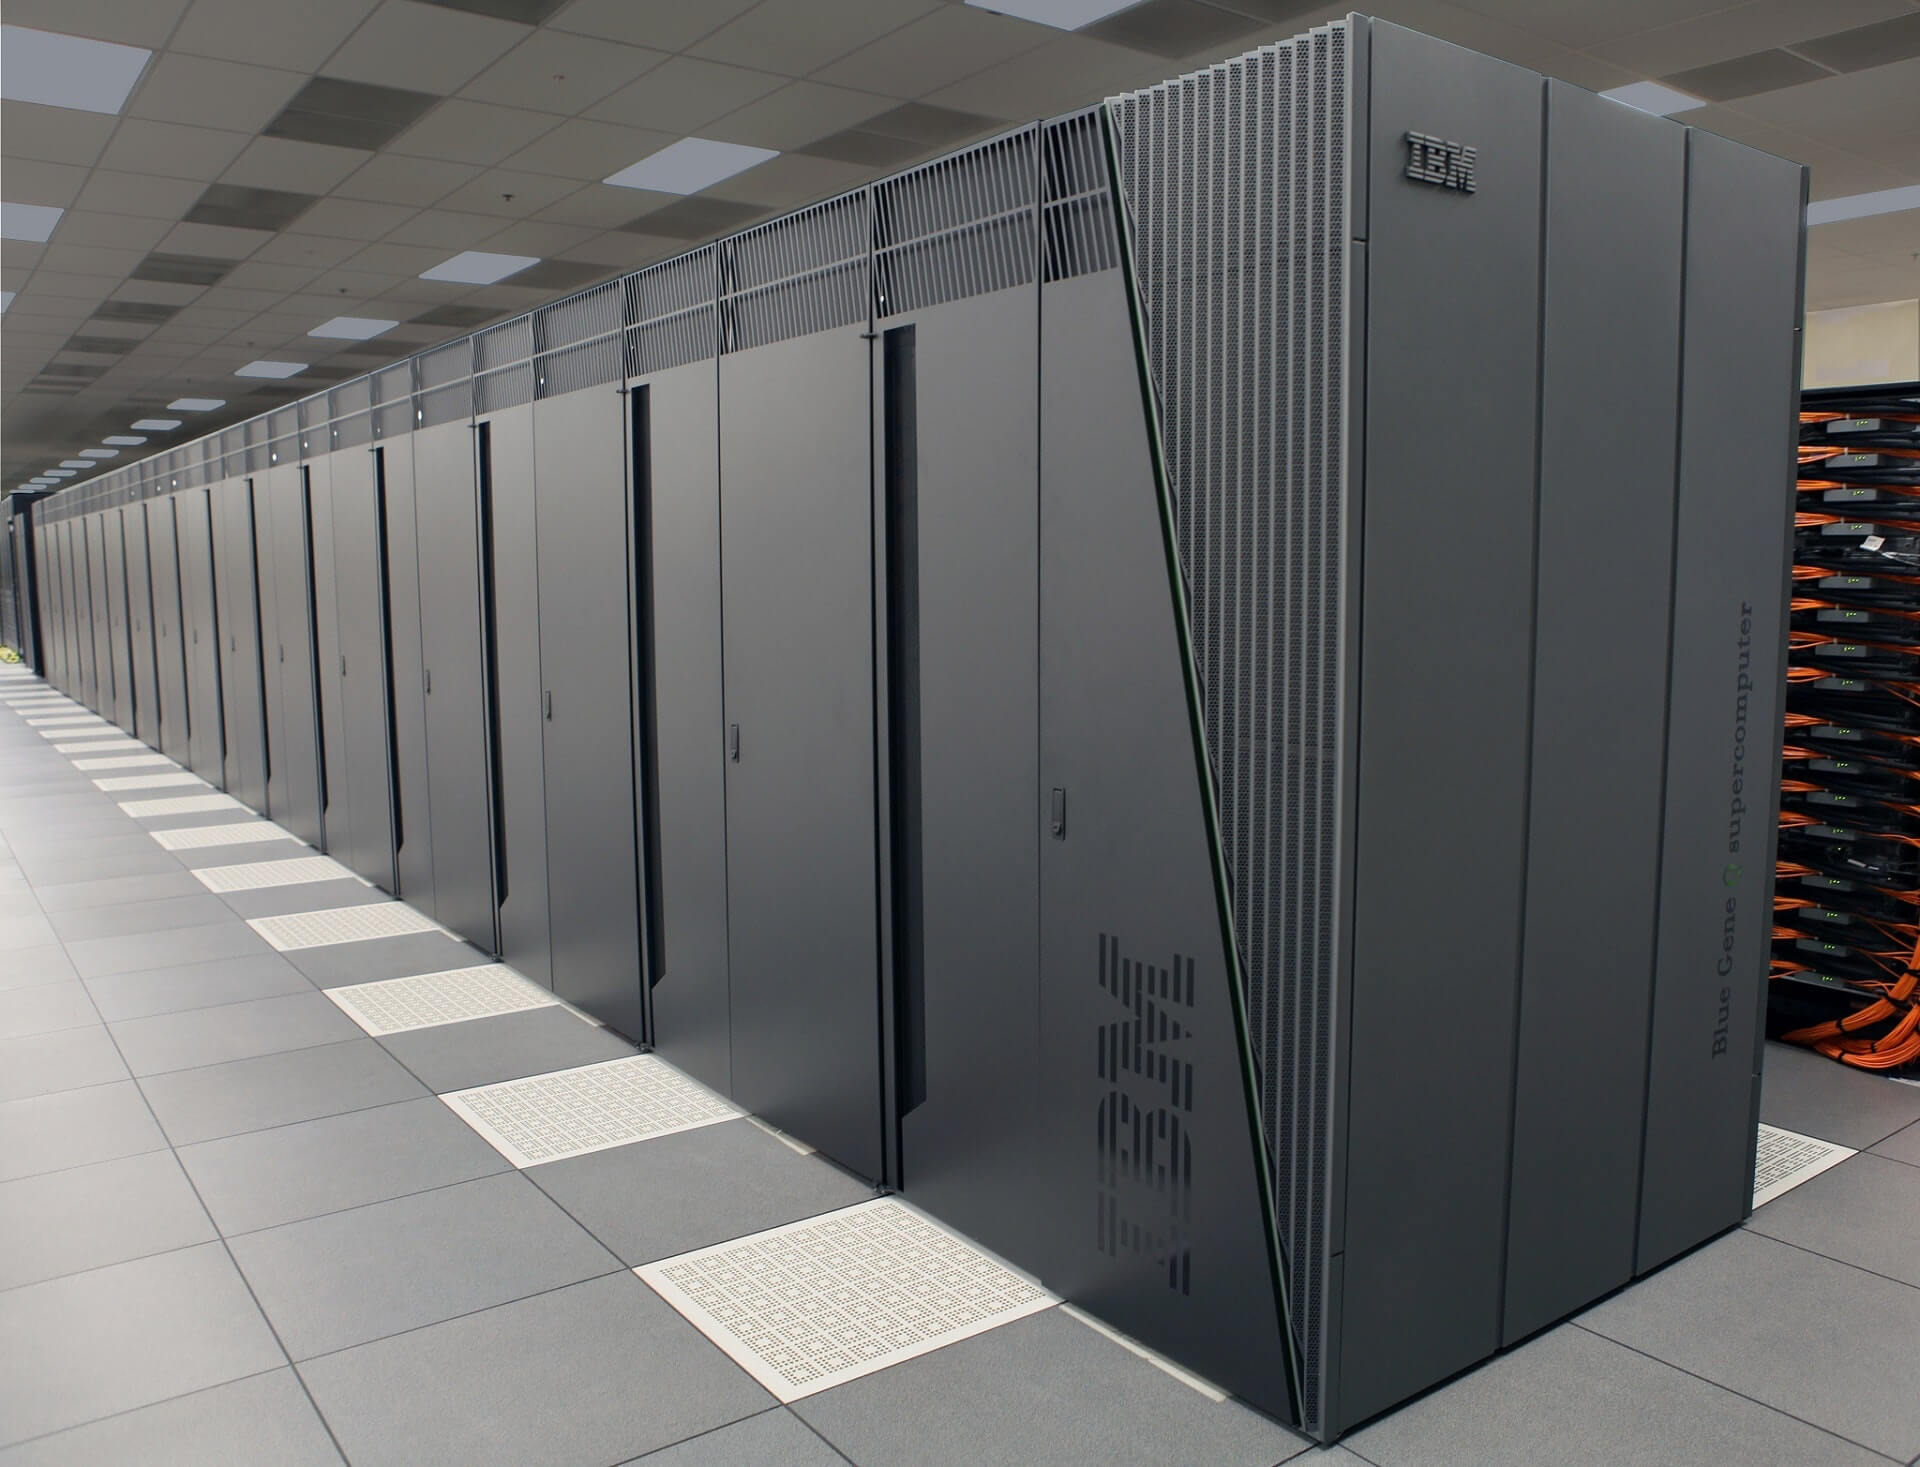 airport-center-computing-236093.jpg